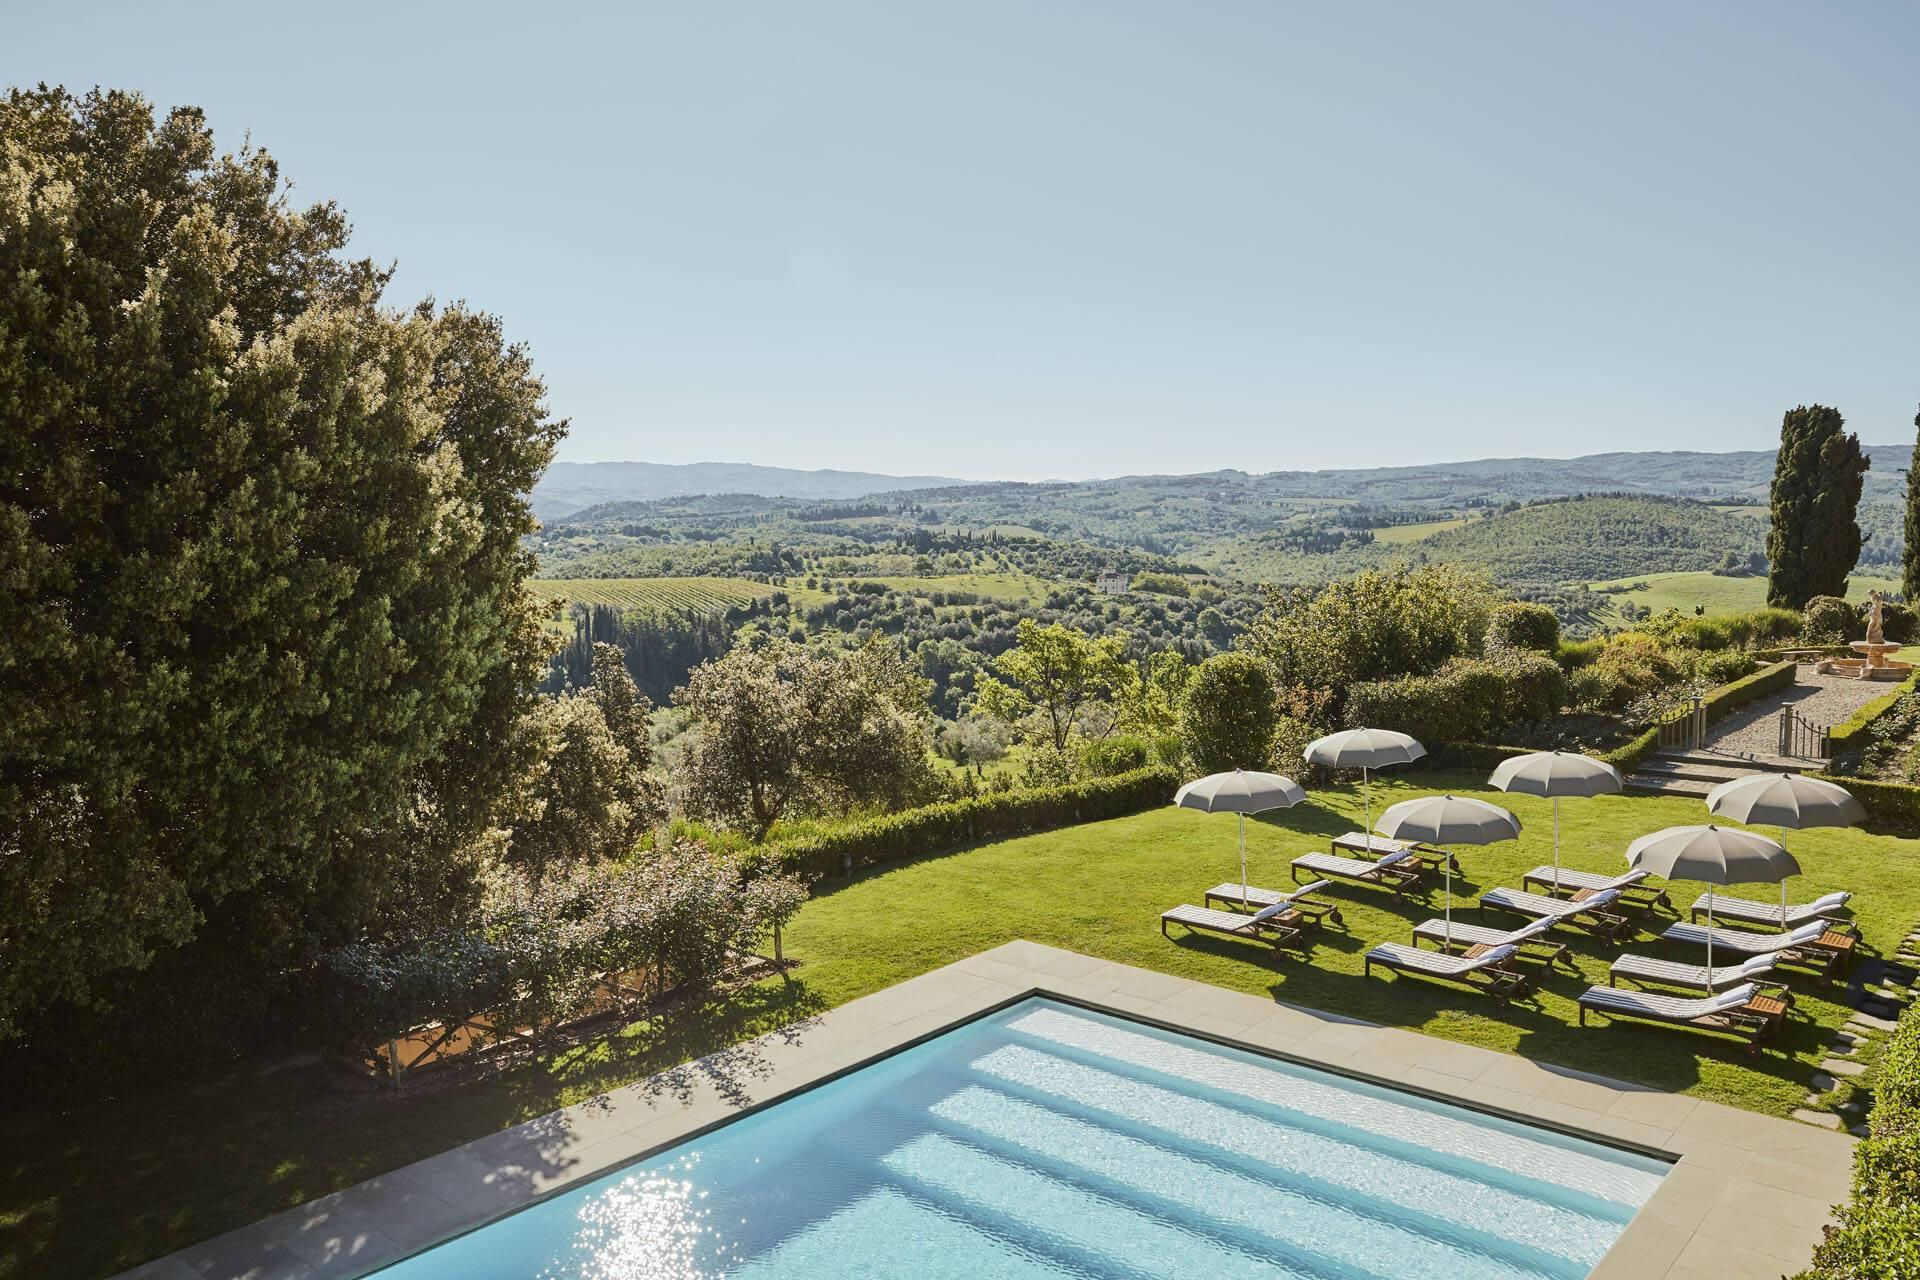 Como Castello del Nero Toscane Piscine Terrasse